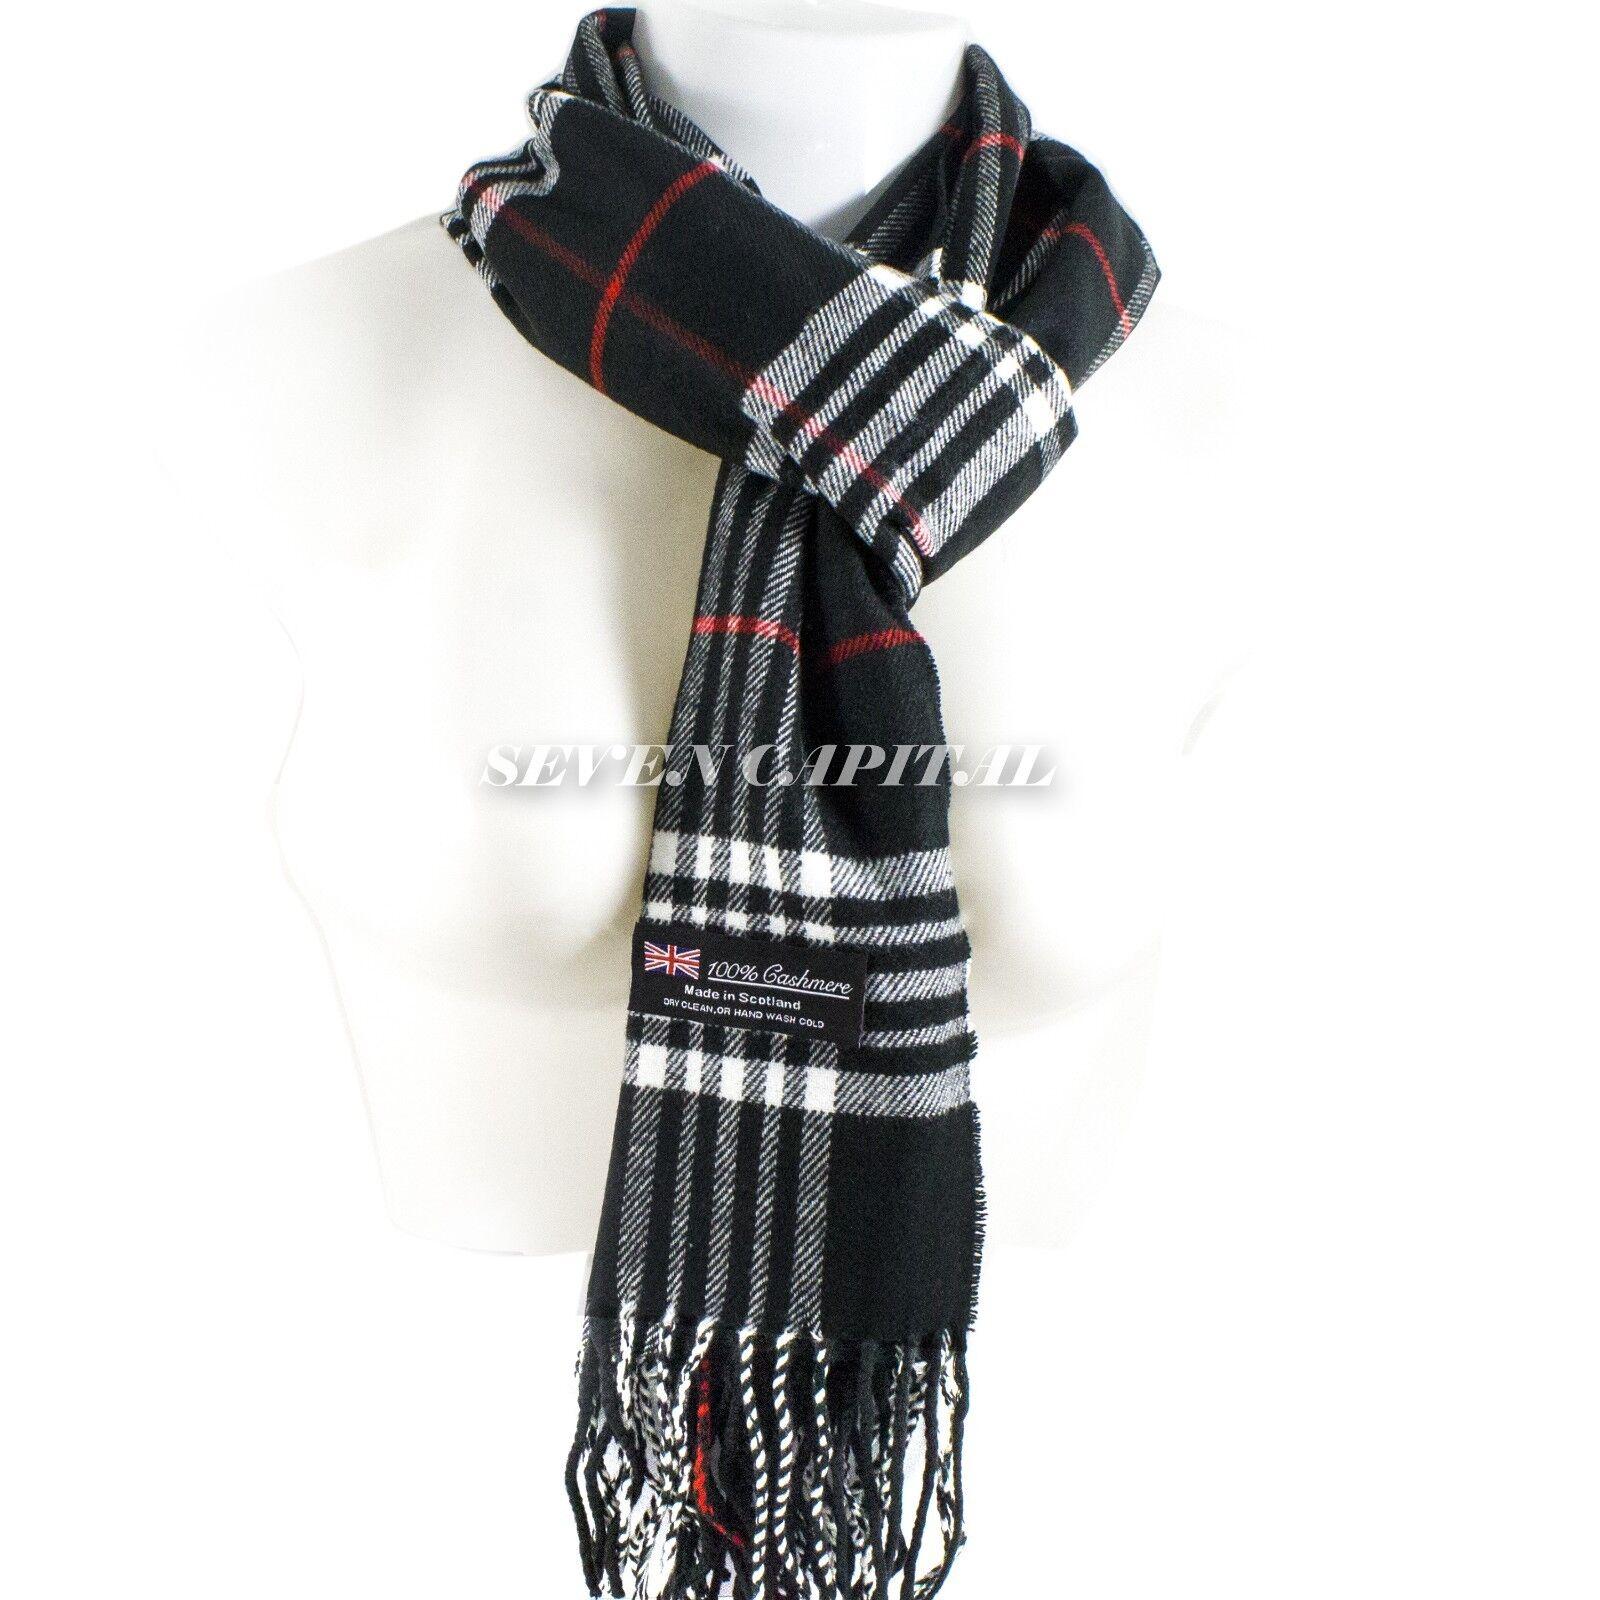 Mens Womens Winter Warm SCOTLAND Made 100% CASHMERE Scarf Scarves Plaid Wool 17. Plaid: Black/White/Red